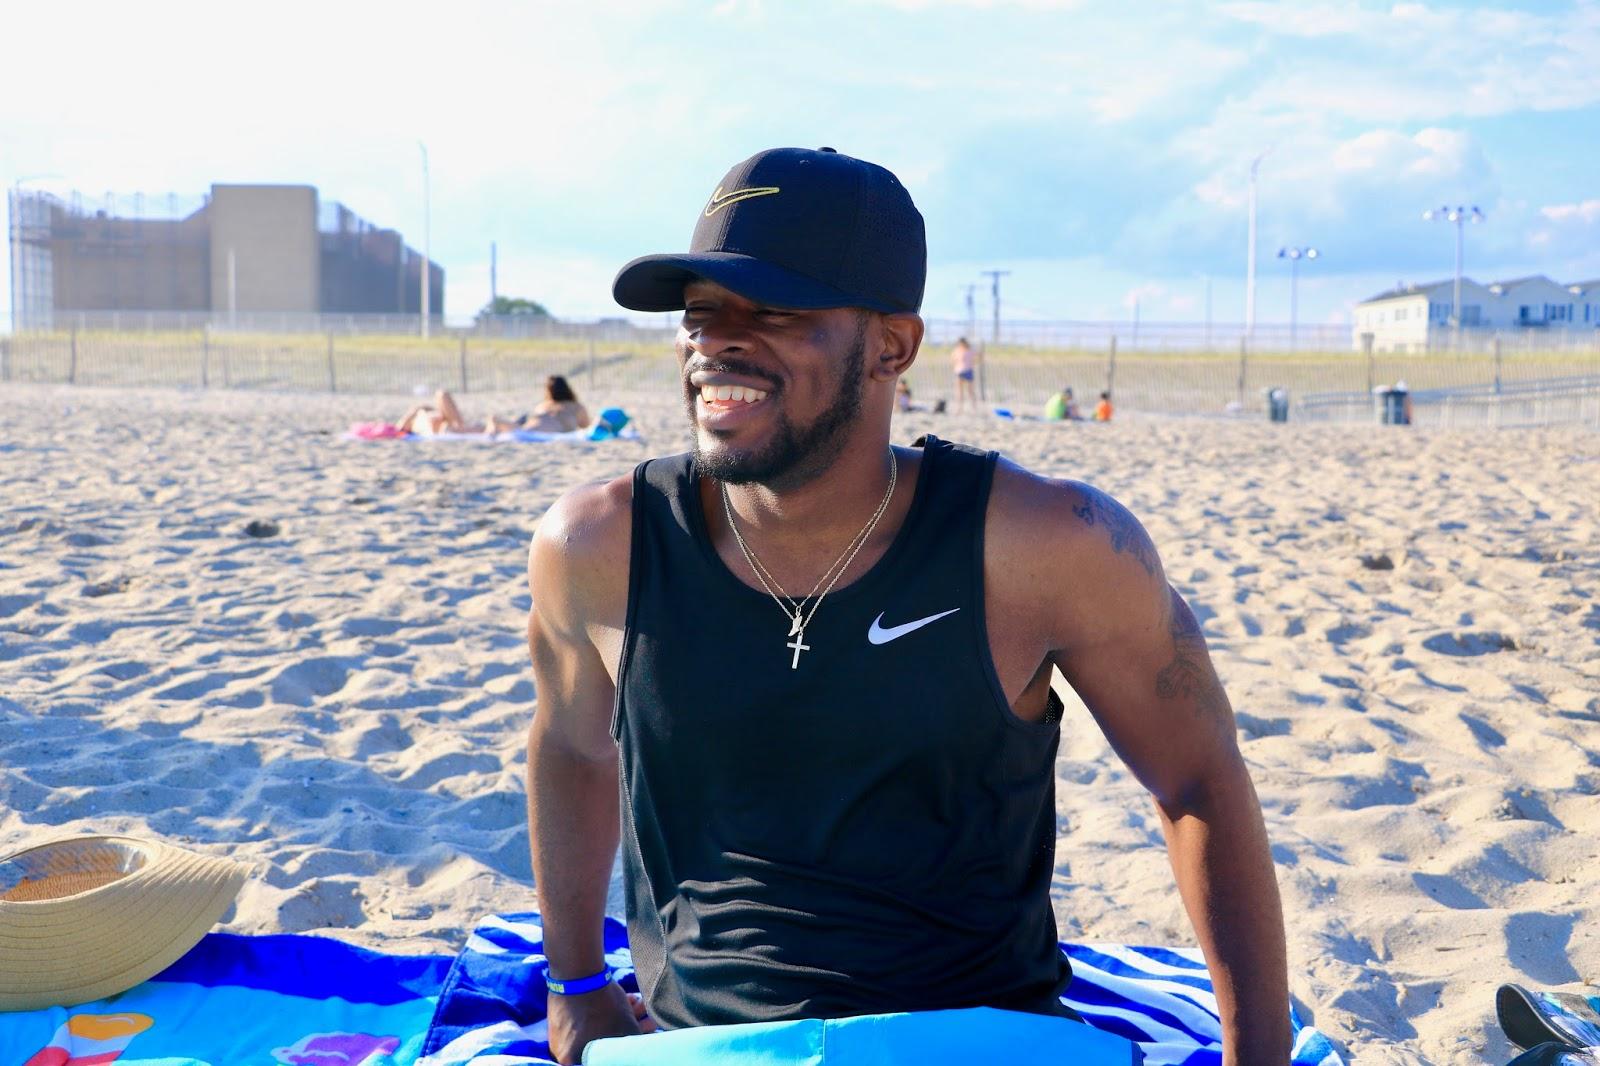 Antonio Owens in Nike athletic wear on the beach